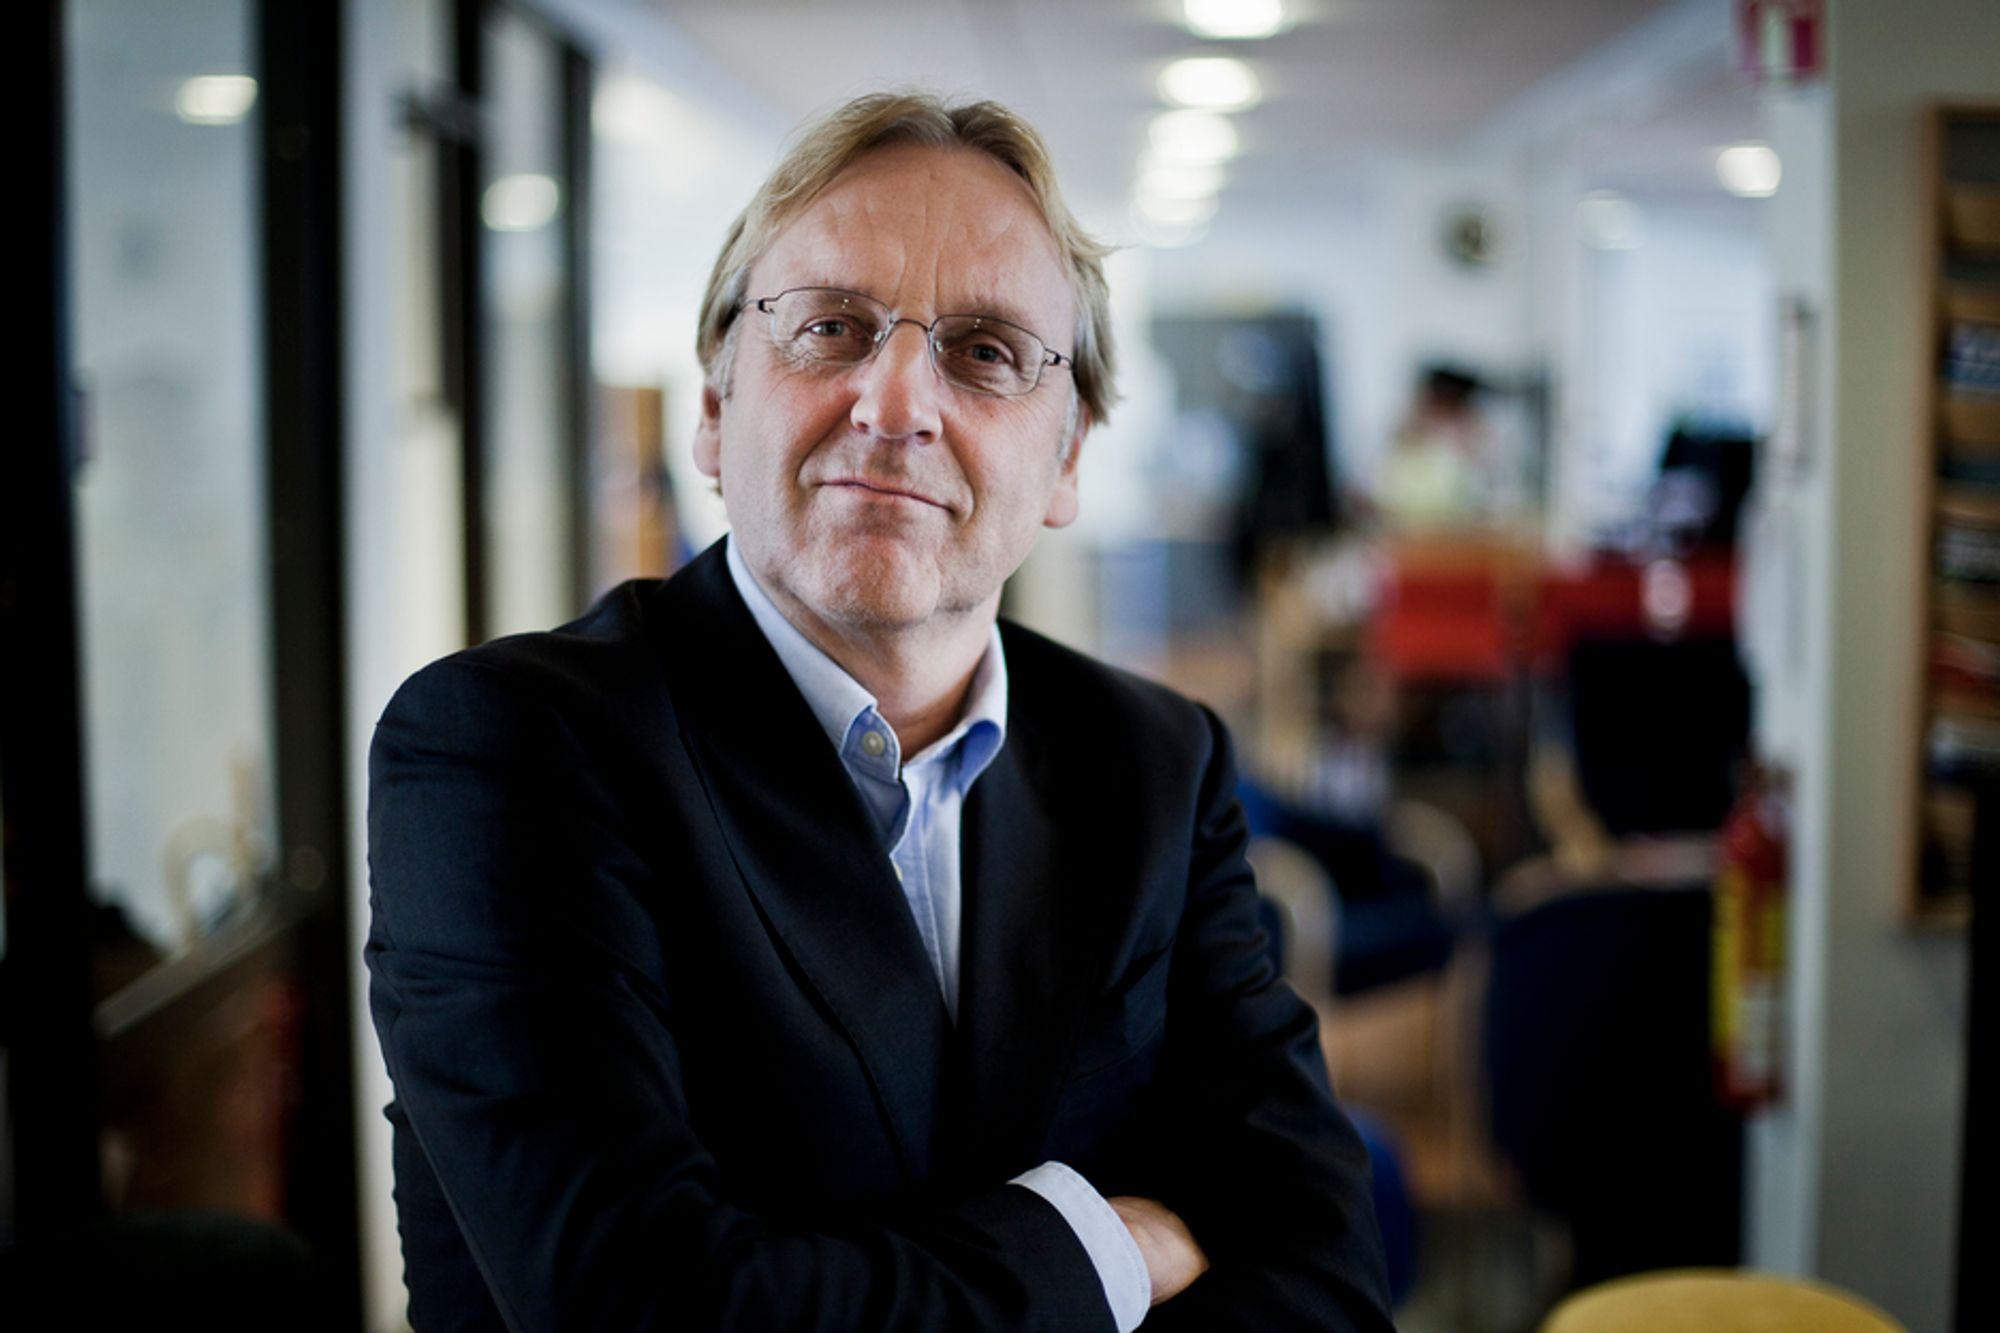 VIL HA SAKLIG DEBATT: Klima handler om jordklodens fremtid. Et så viktig tema fortjener en saklig debatt, også i debattfeltet på tu.no, mener ansvarlig redaktør Tormod Haugstad.